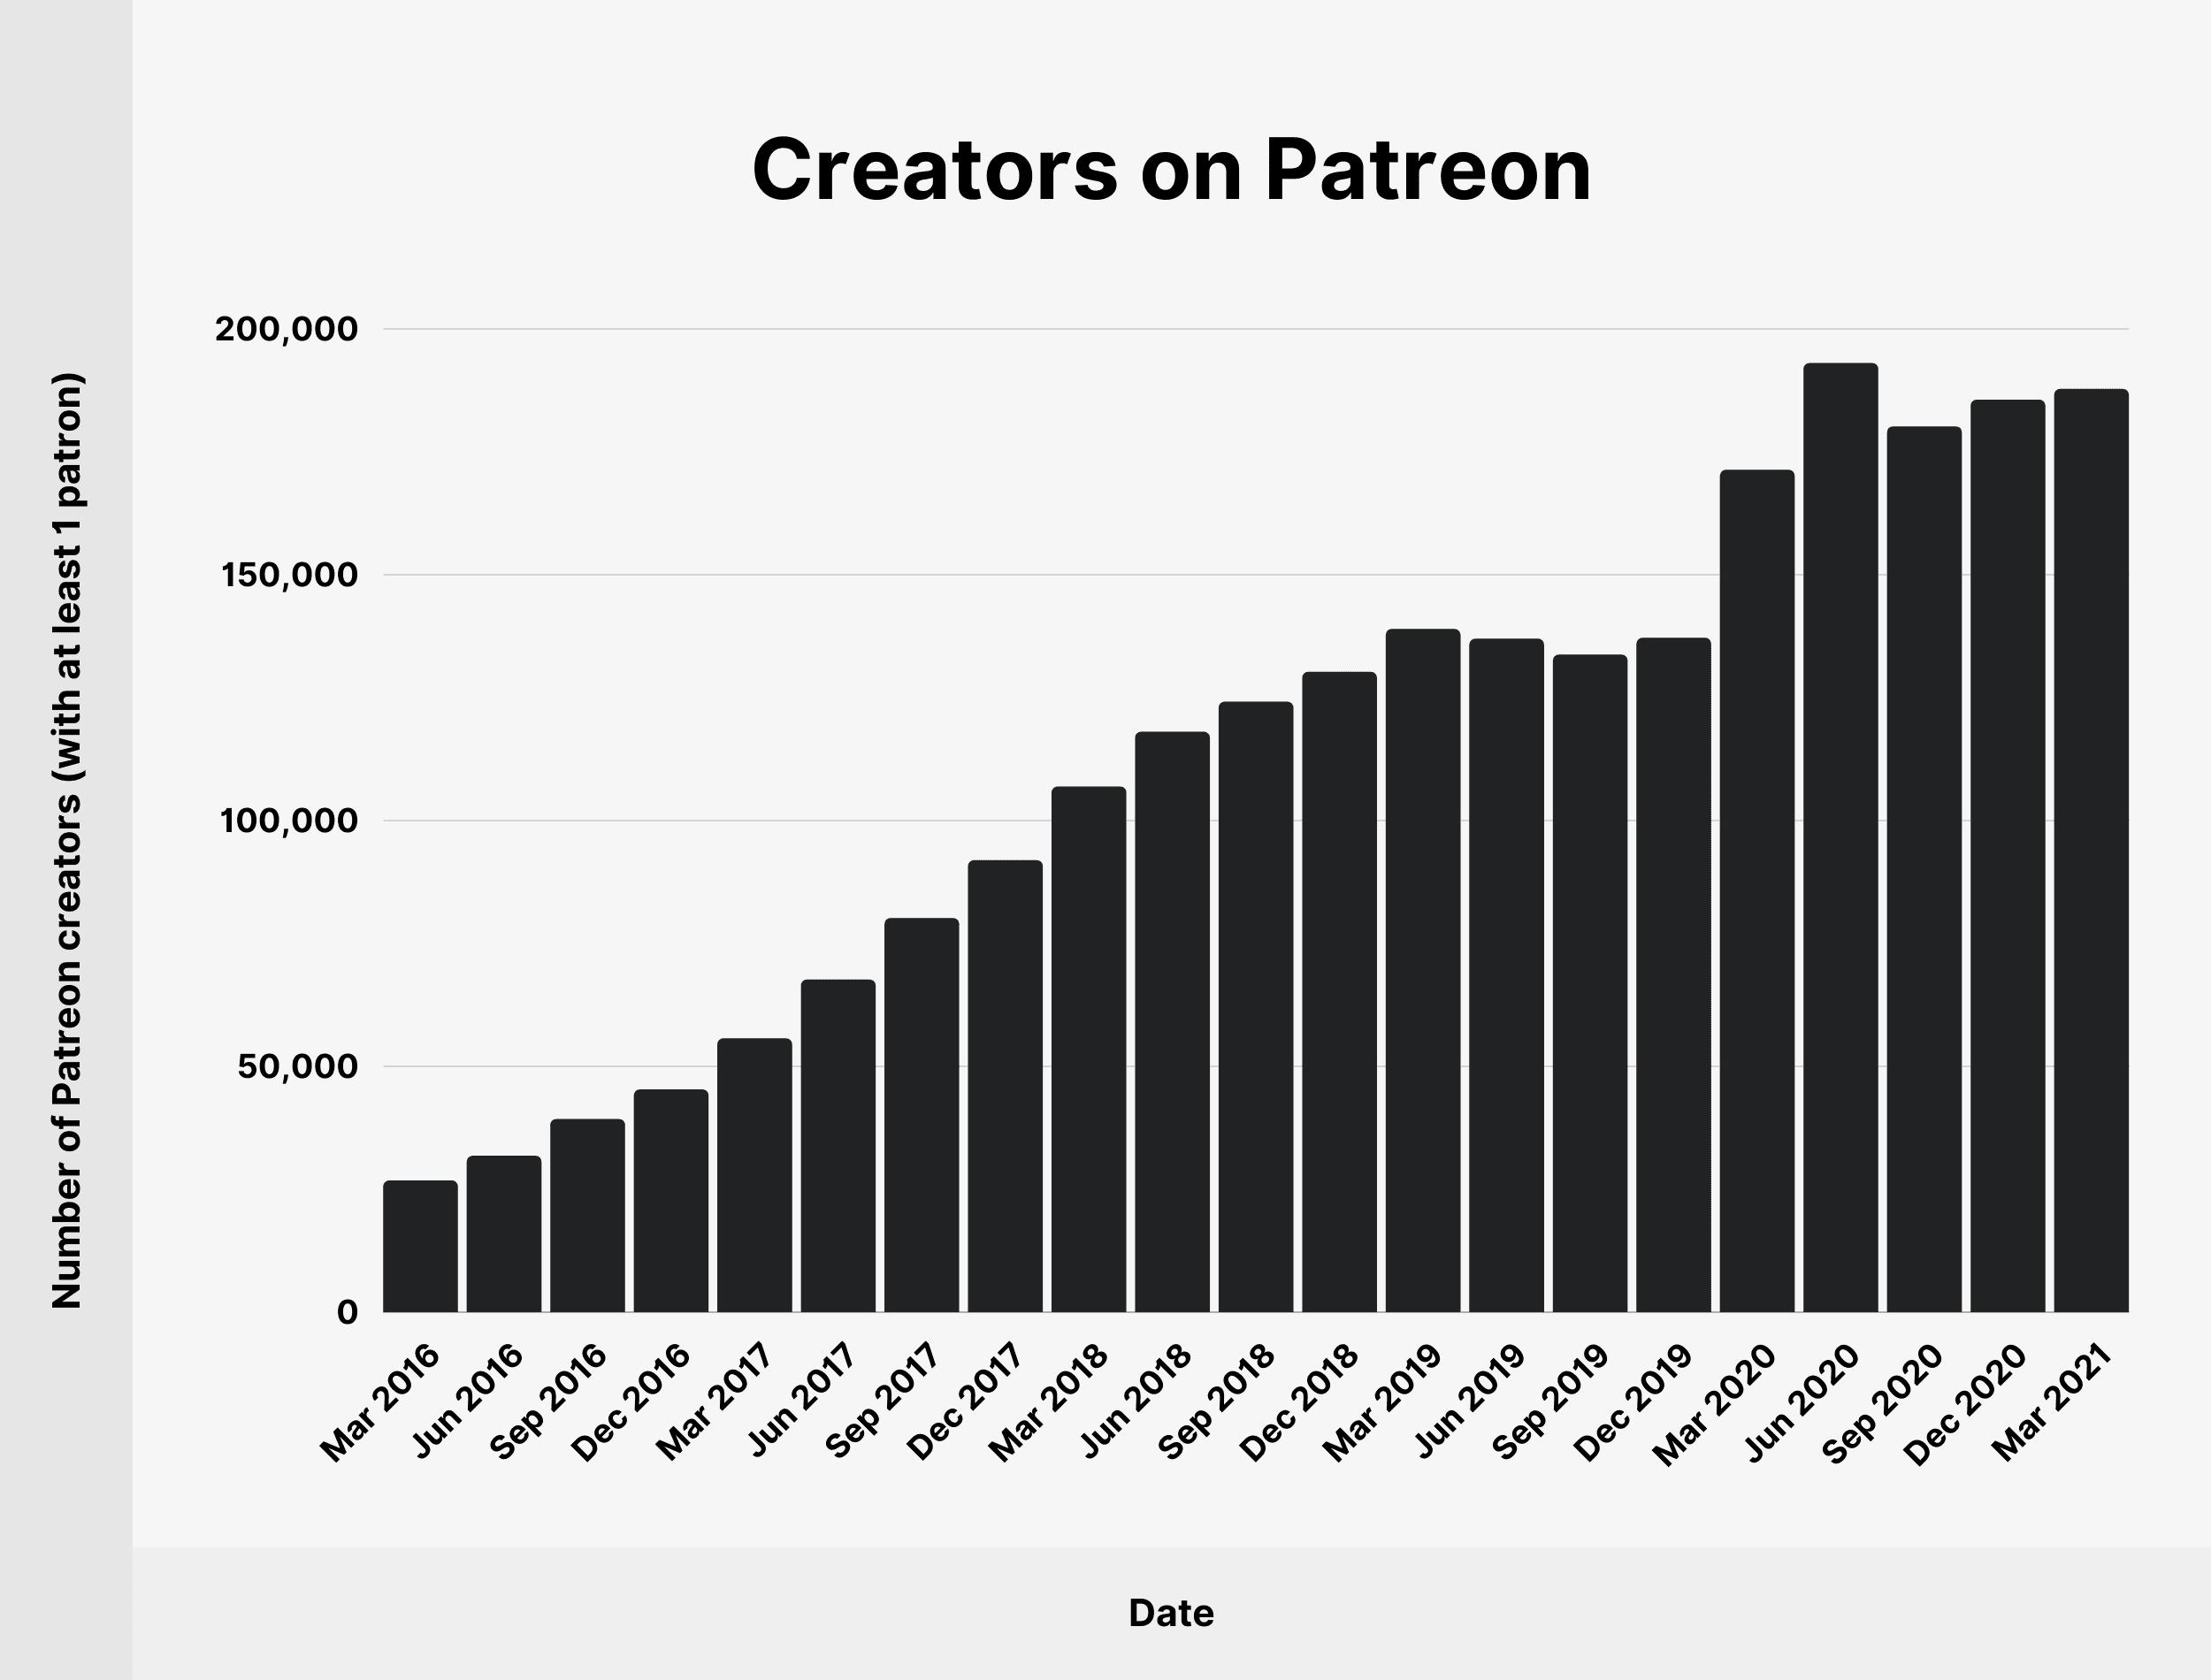 Creators on Patreon